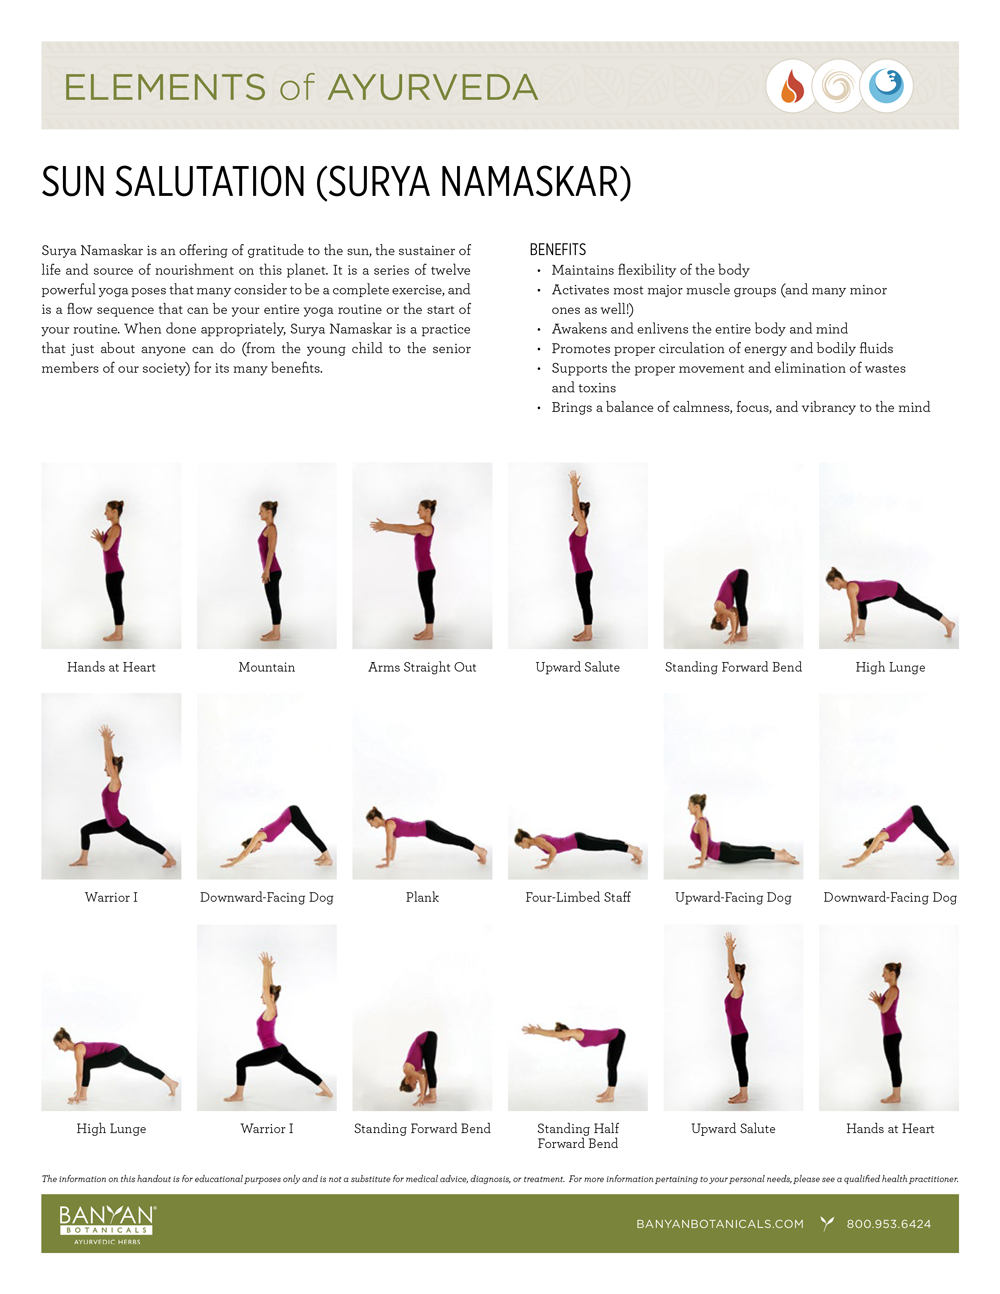 Elements of Ayurveda Handout: Sun Salutation